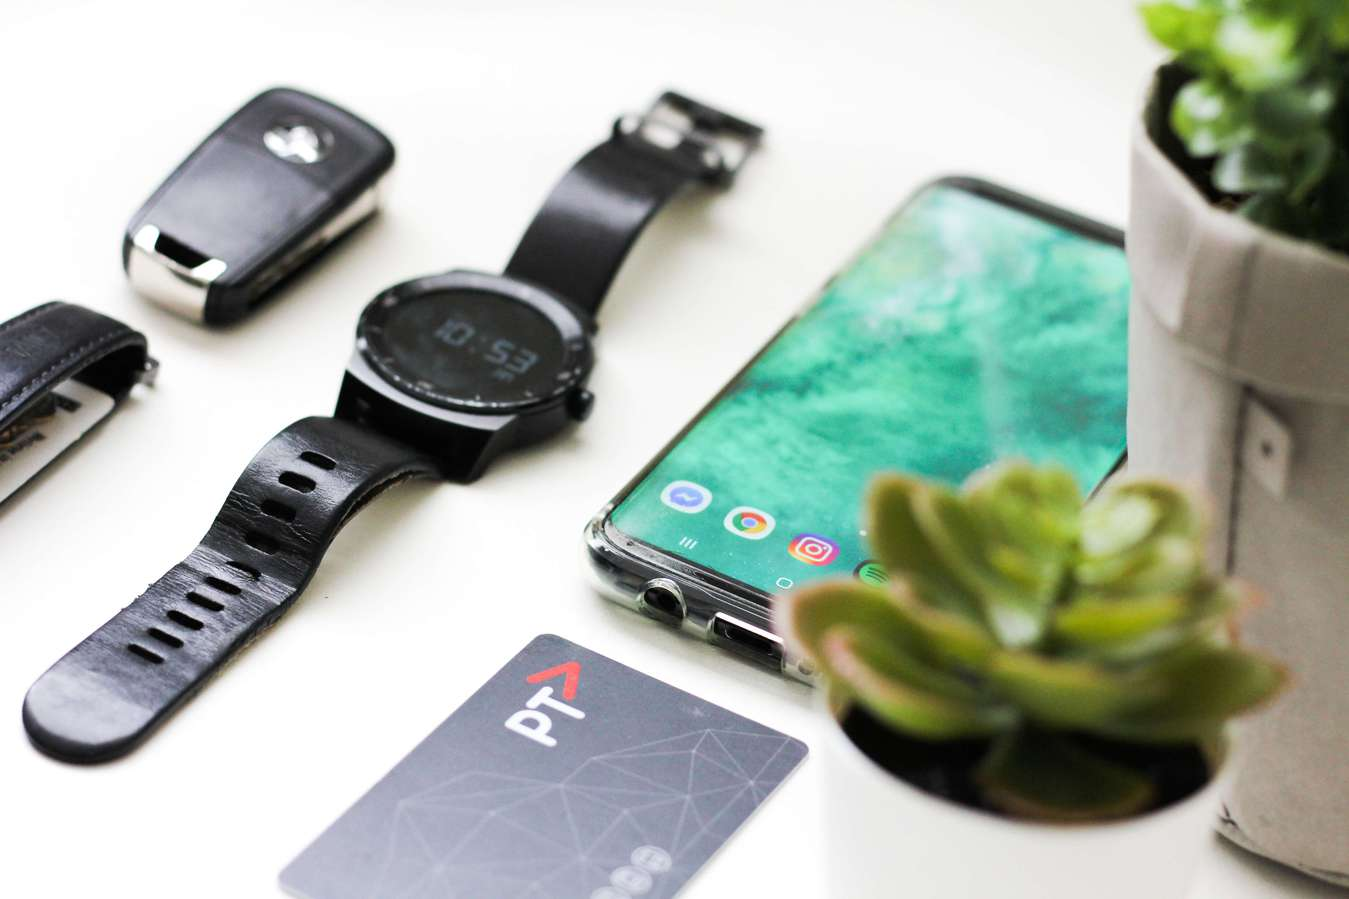 Aksesori dan alat elektronik